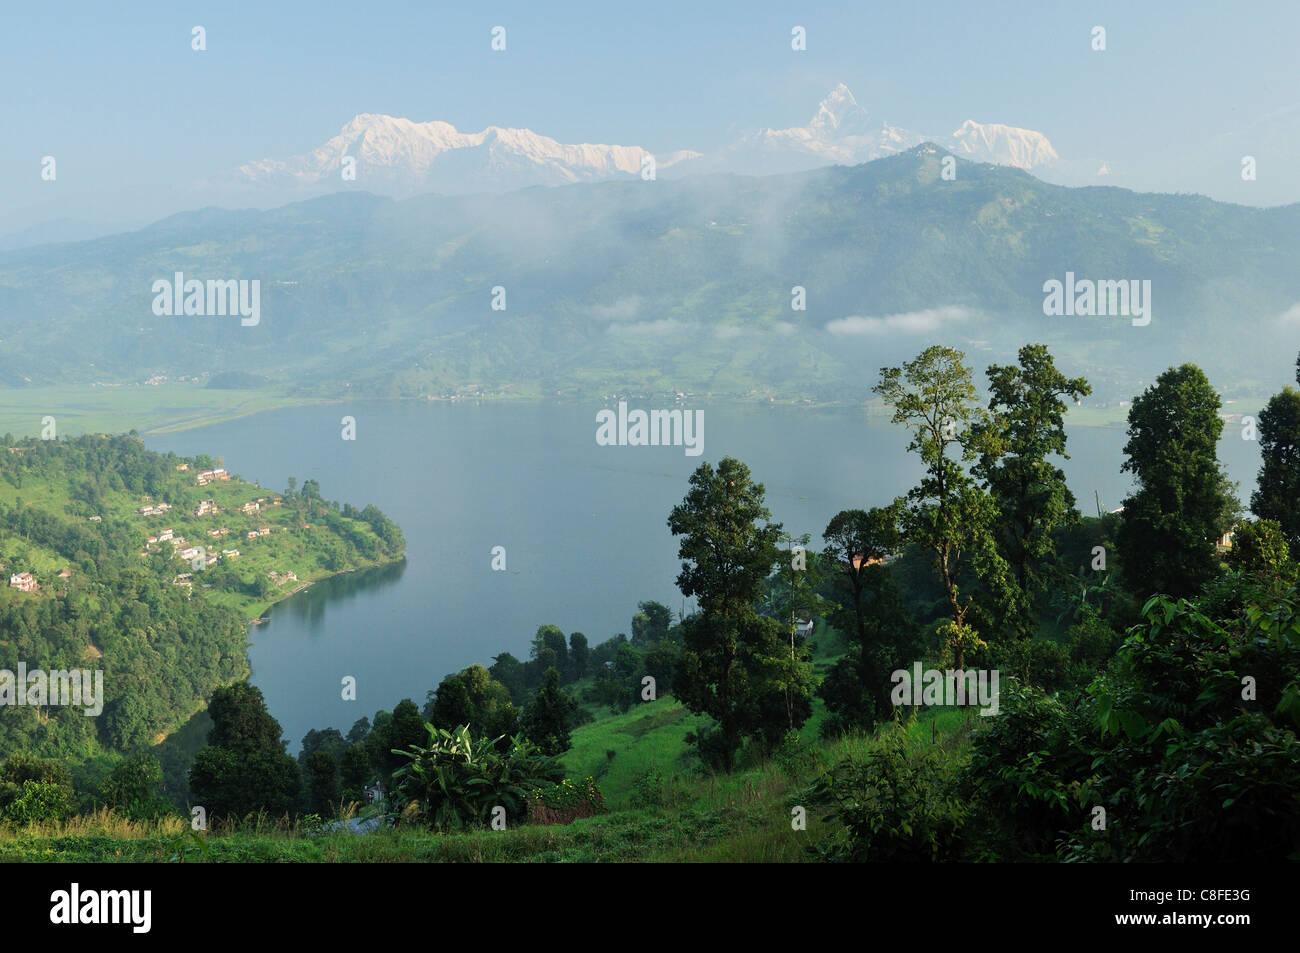 Phewa Tal (Phewa Lake) and Annapurna Himal and Machapuchare seen from Peace Pagoda, Pokhara, Gandaki, Pashchimanchal, - Stock Image